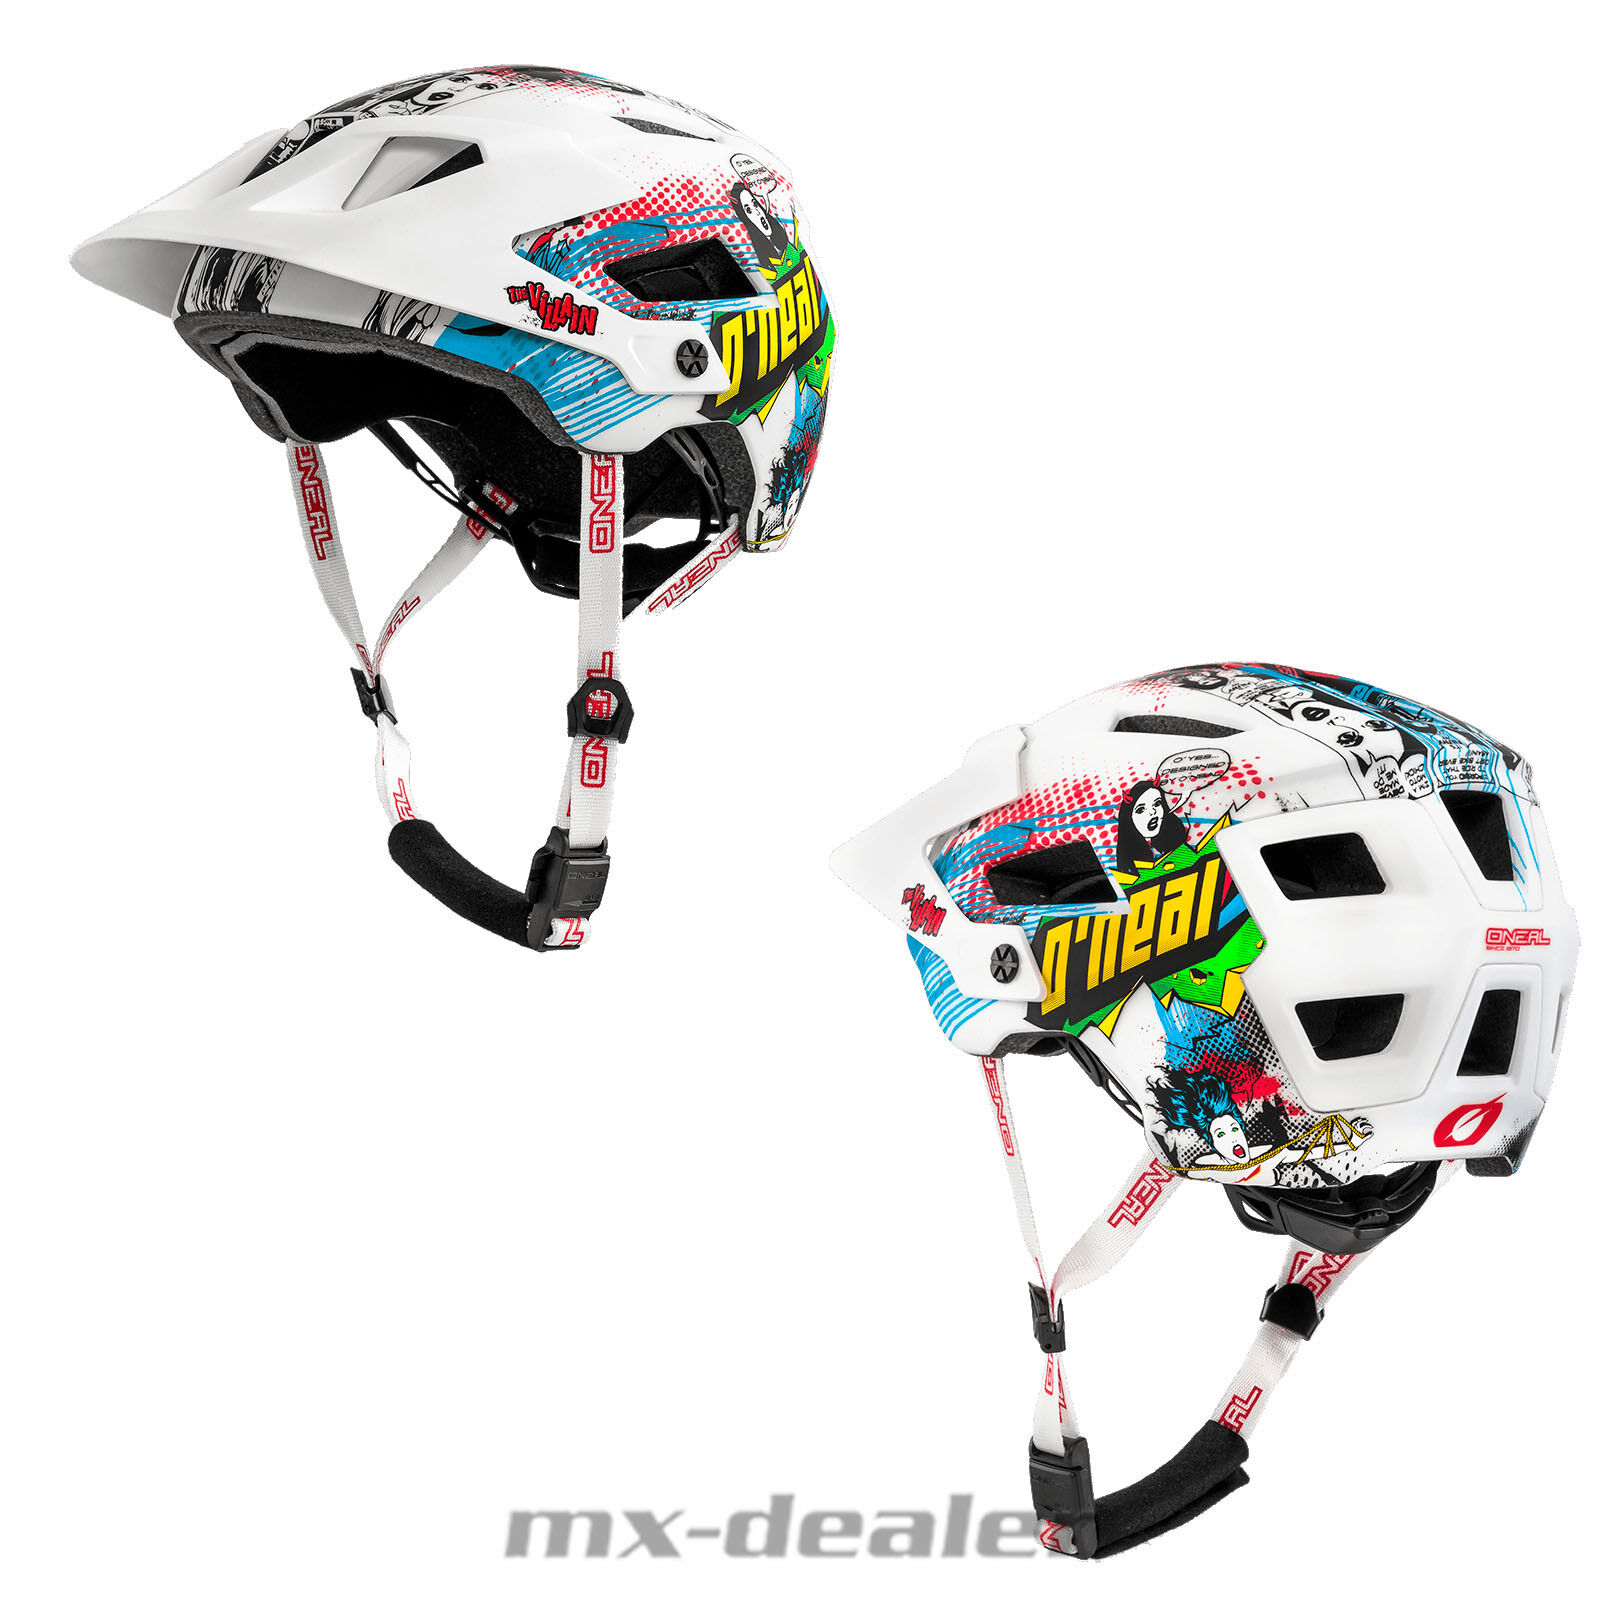 O'Neal Defender 2.0 Fahrrad Helm All Mountain Fahrrad Trail MTB Enduro VILLAIN